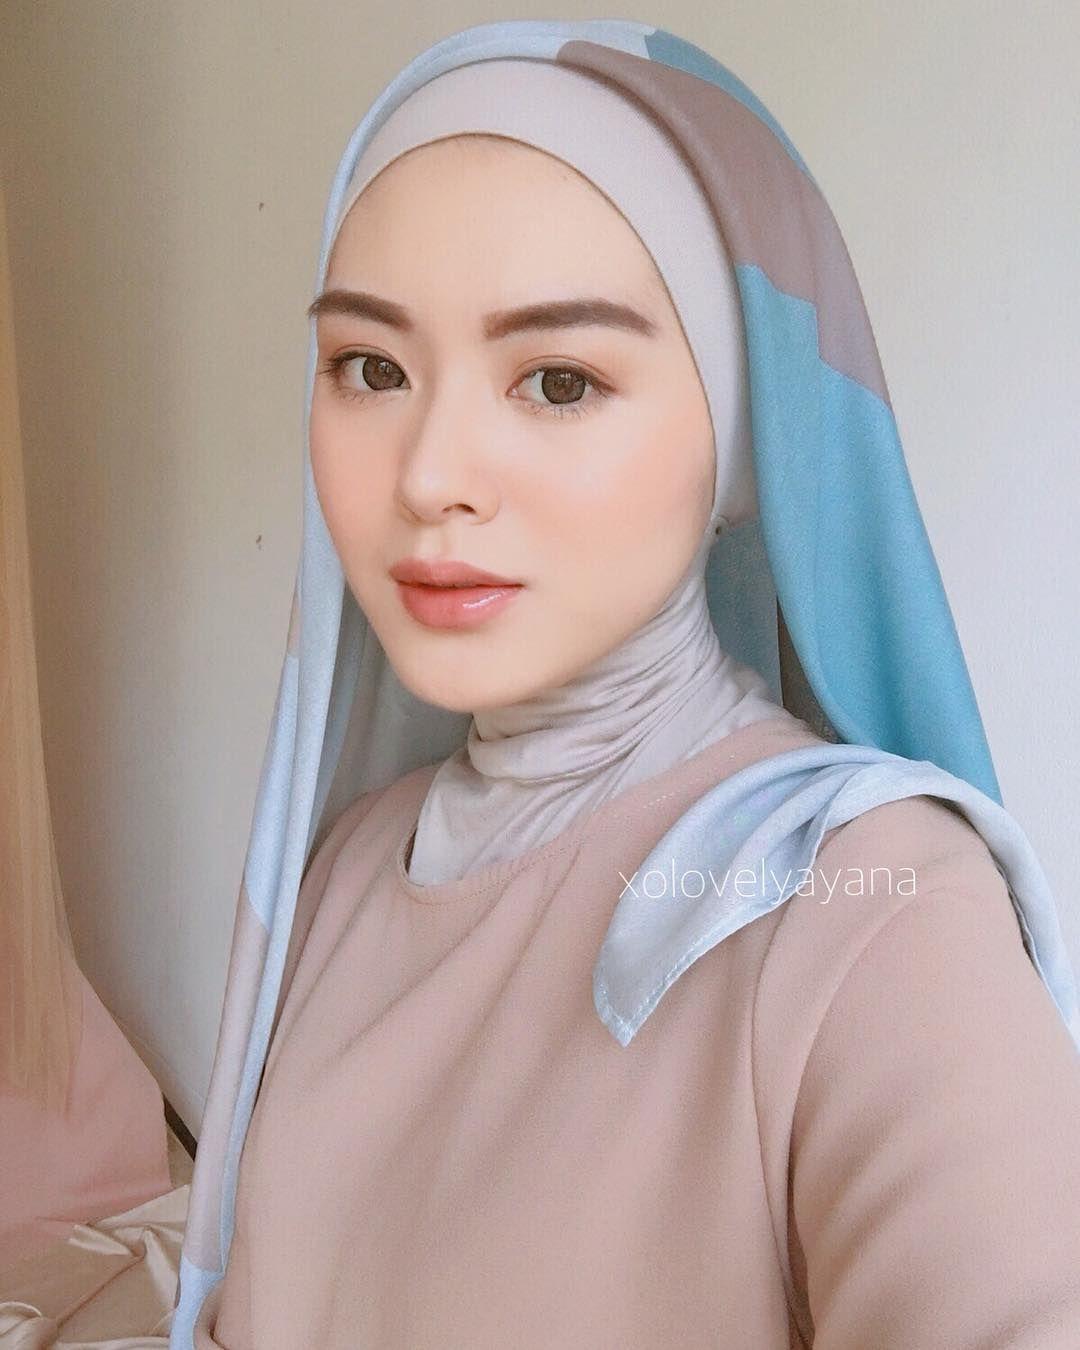 993 4rb Pengikut 367 Mengikuti 542 Kiriman Lihat Foto Dan Video Instagram Dari Ayana Jihye Moon Xolovelyayana Gambar Hamil Gadis Cantik Asia Wanita